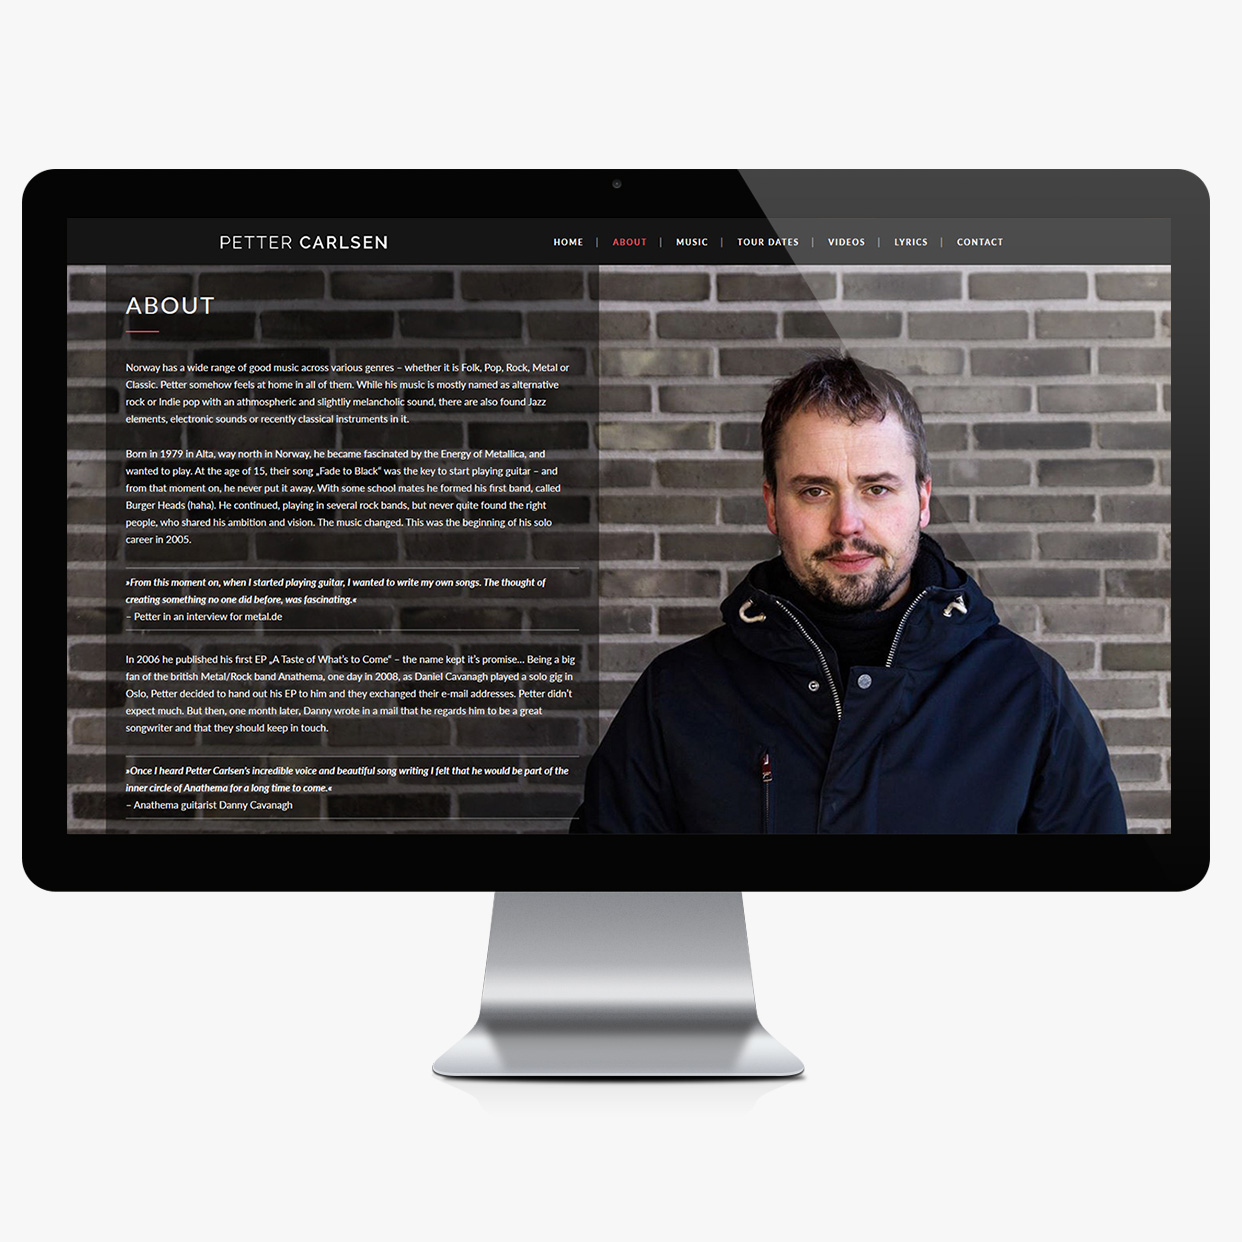 petter-carlsen-web-about